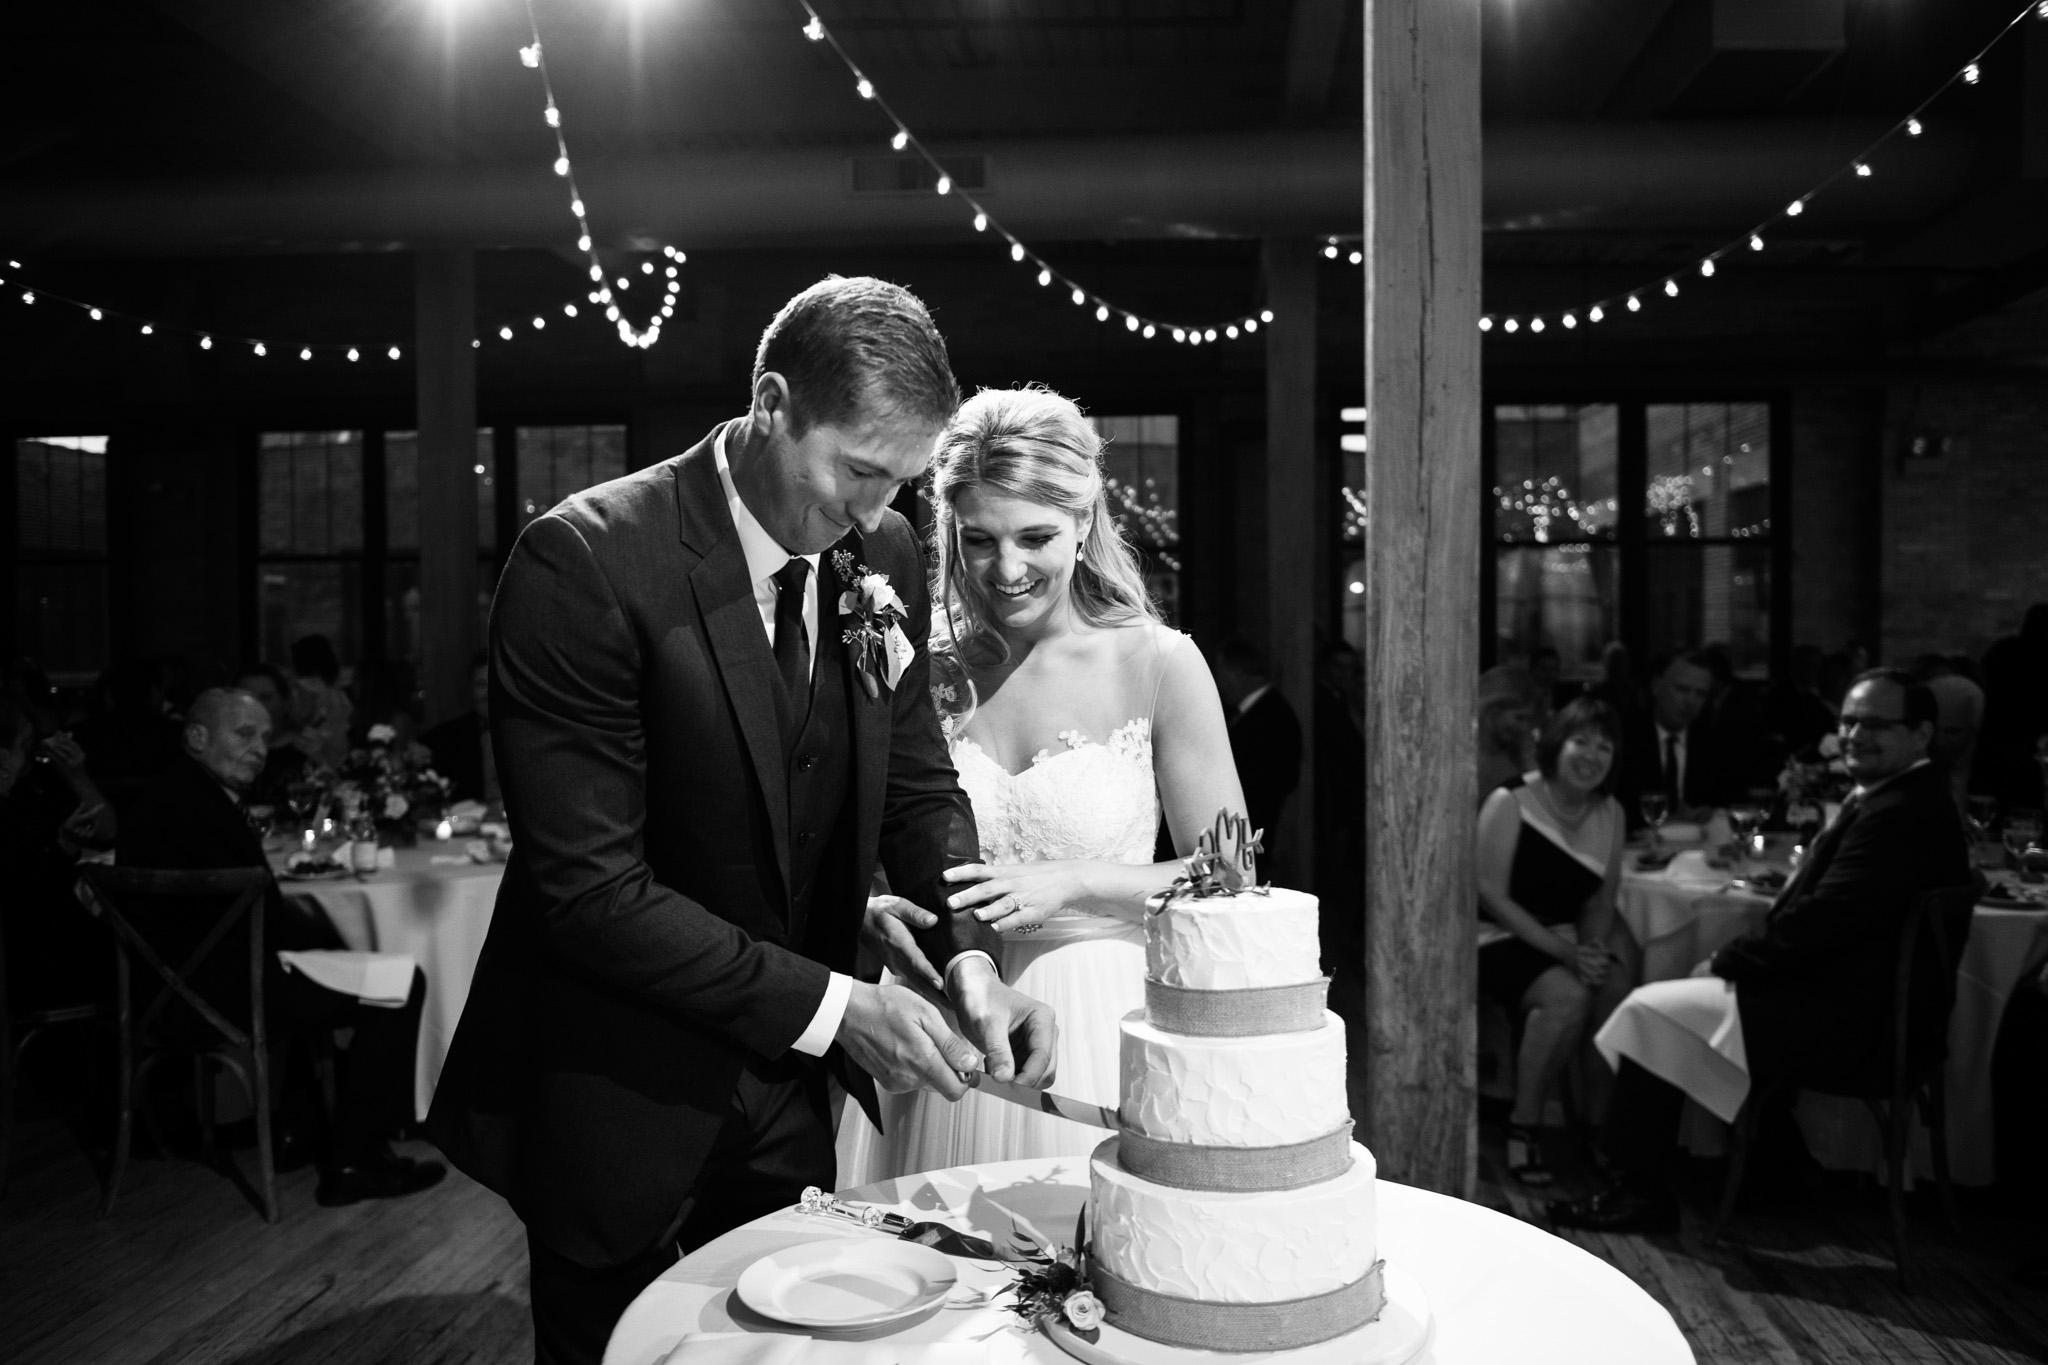 bridgeport-art-center-wedding-photos-34.jpg